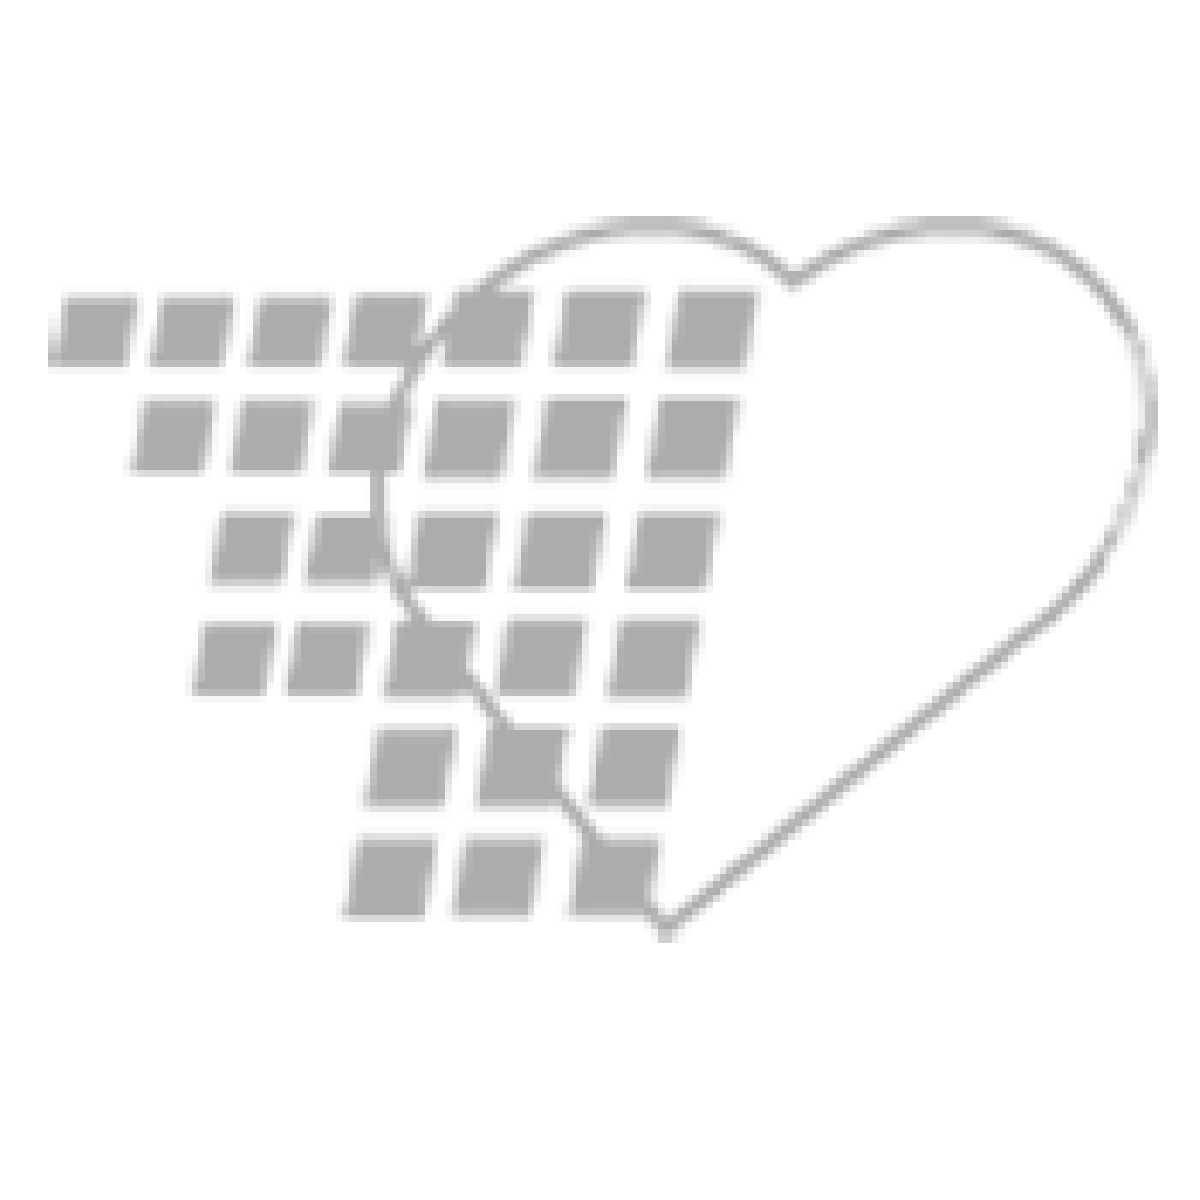 05-44-0001 Laerdal Sta-Blok™ Head Immobilizer